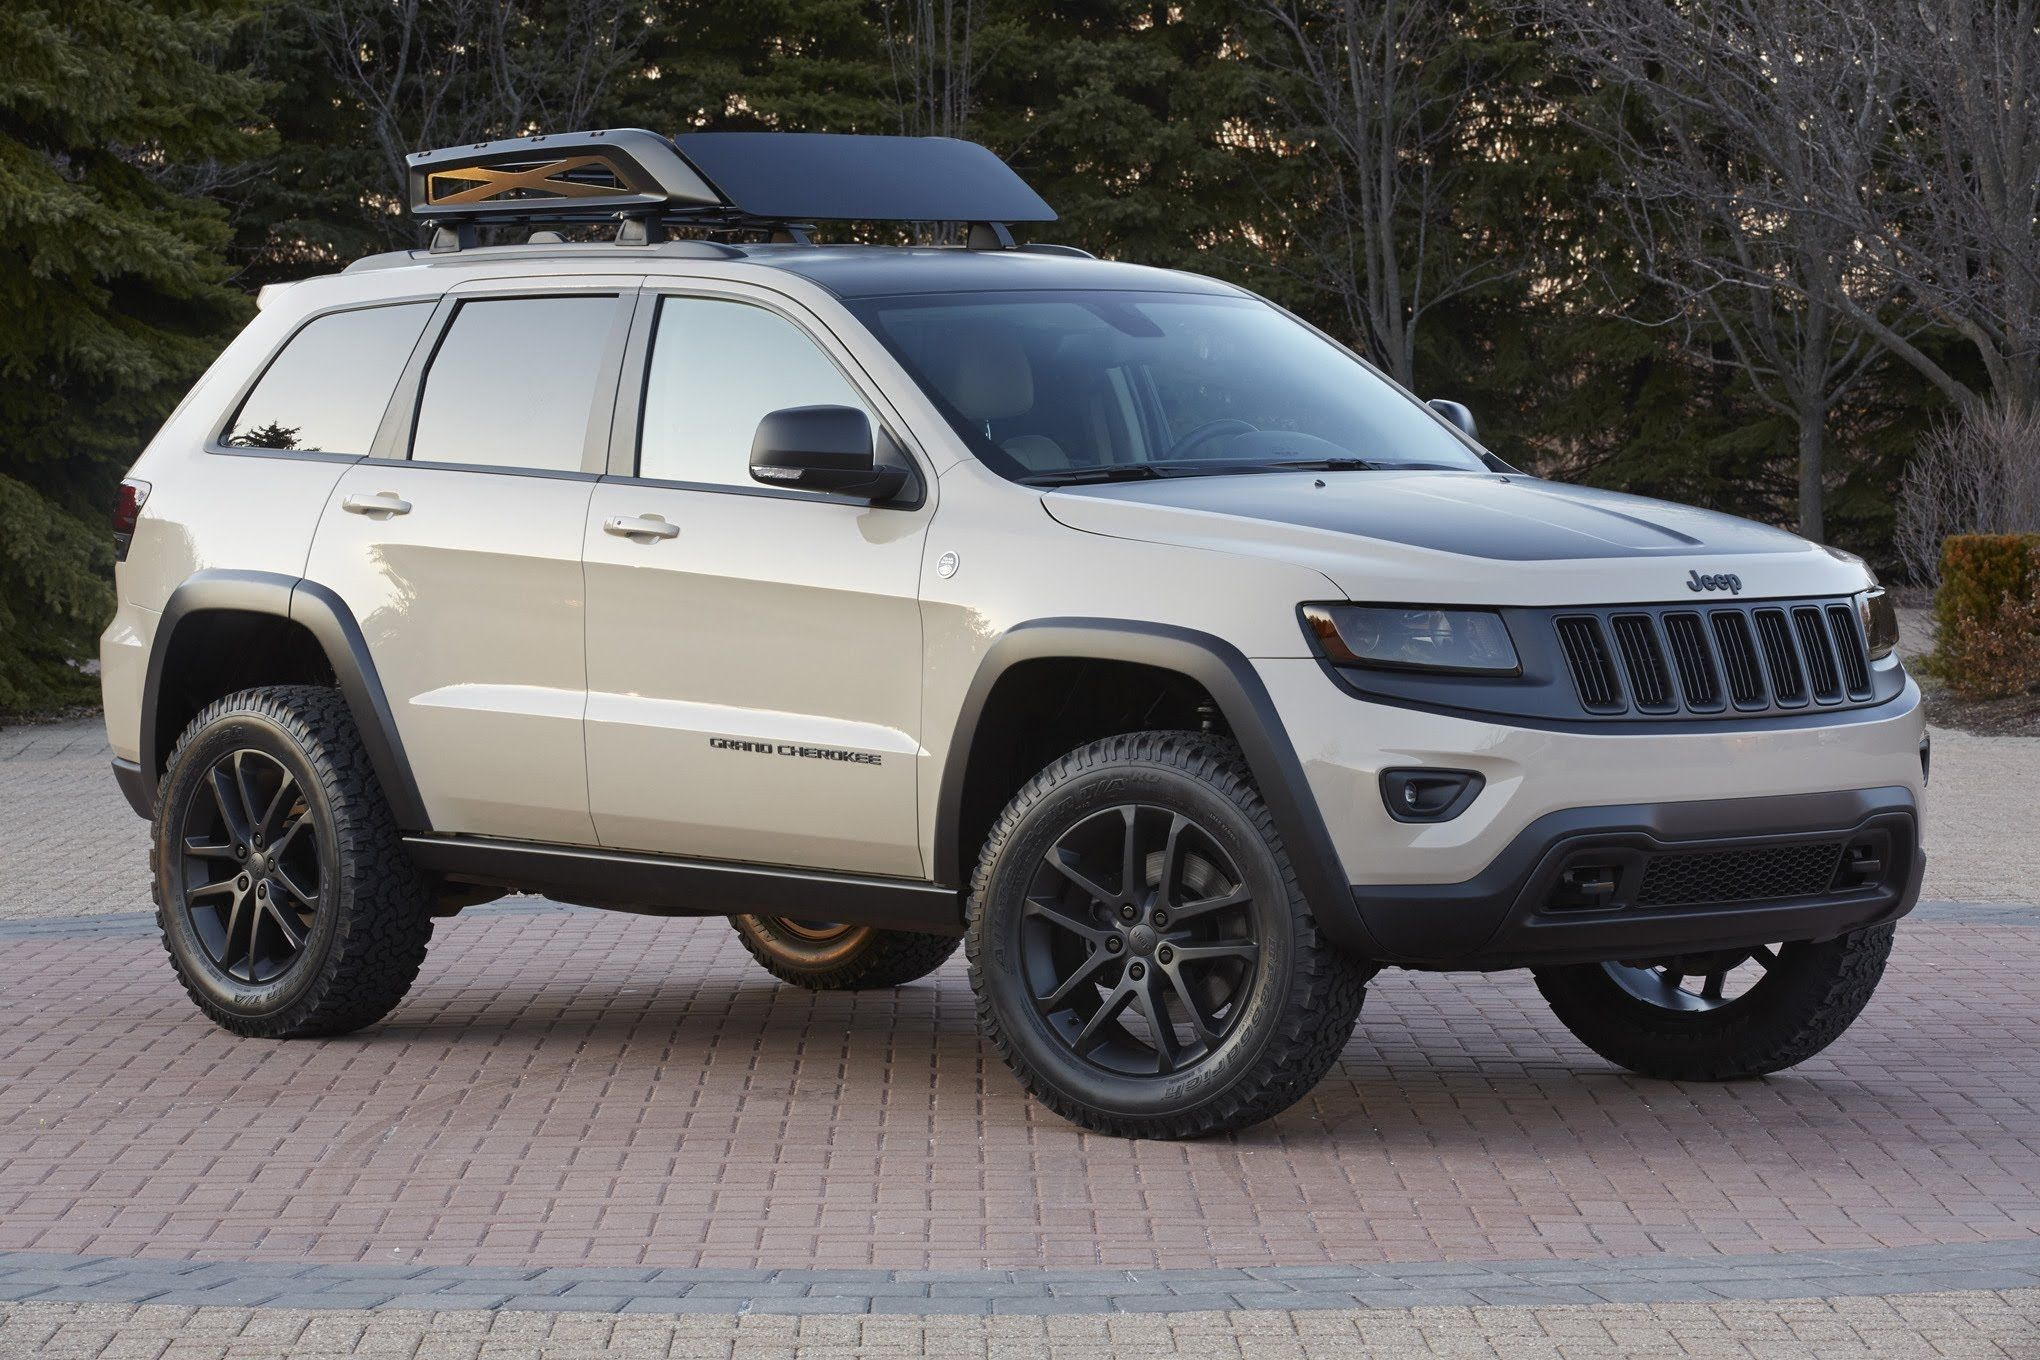 Grand Cherokee Ecodiesel >> 2014 Jeep Grand Cherokee Ecodiesel Trail Warrior Concept